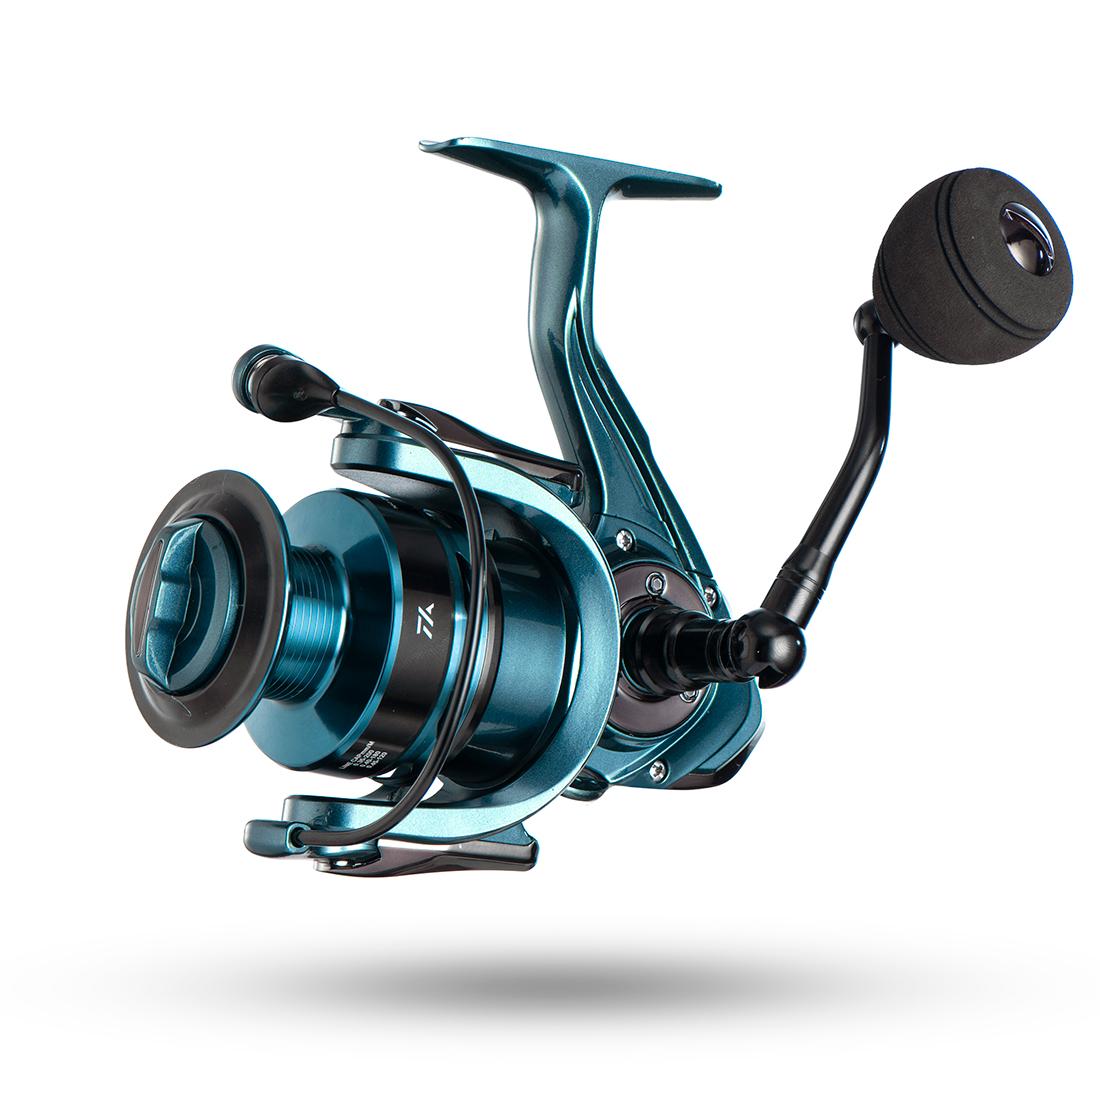 Fishing Reel 14+1BB Deep Spool 5.5:1 4.7:1 Gear Ratio High Speed Spinning Reel Casting reel Carp For Saltwater 3000 D deep cup